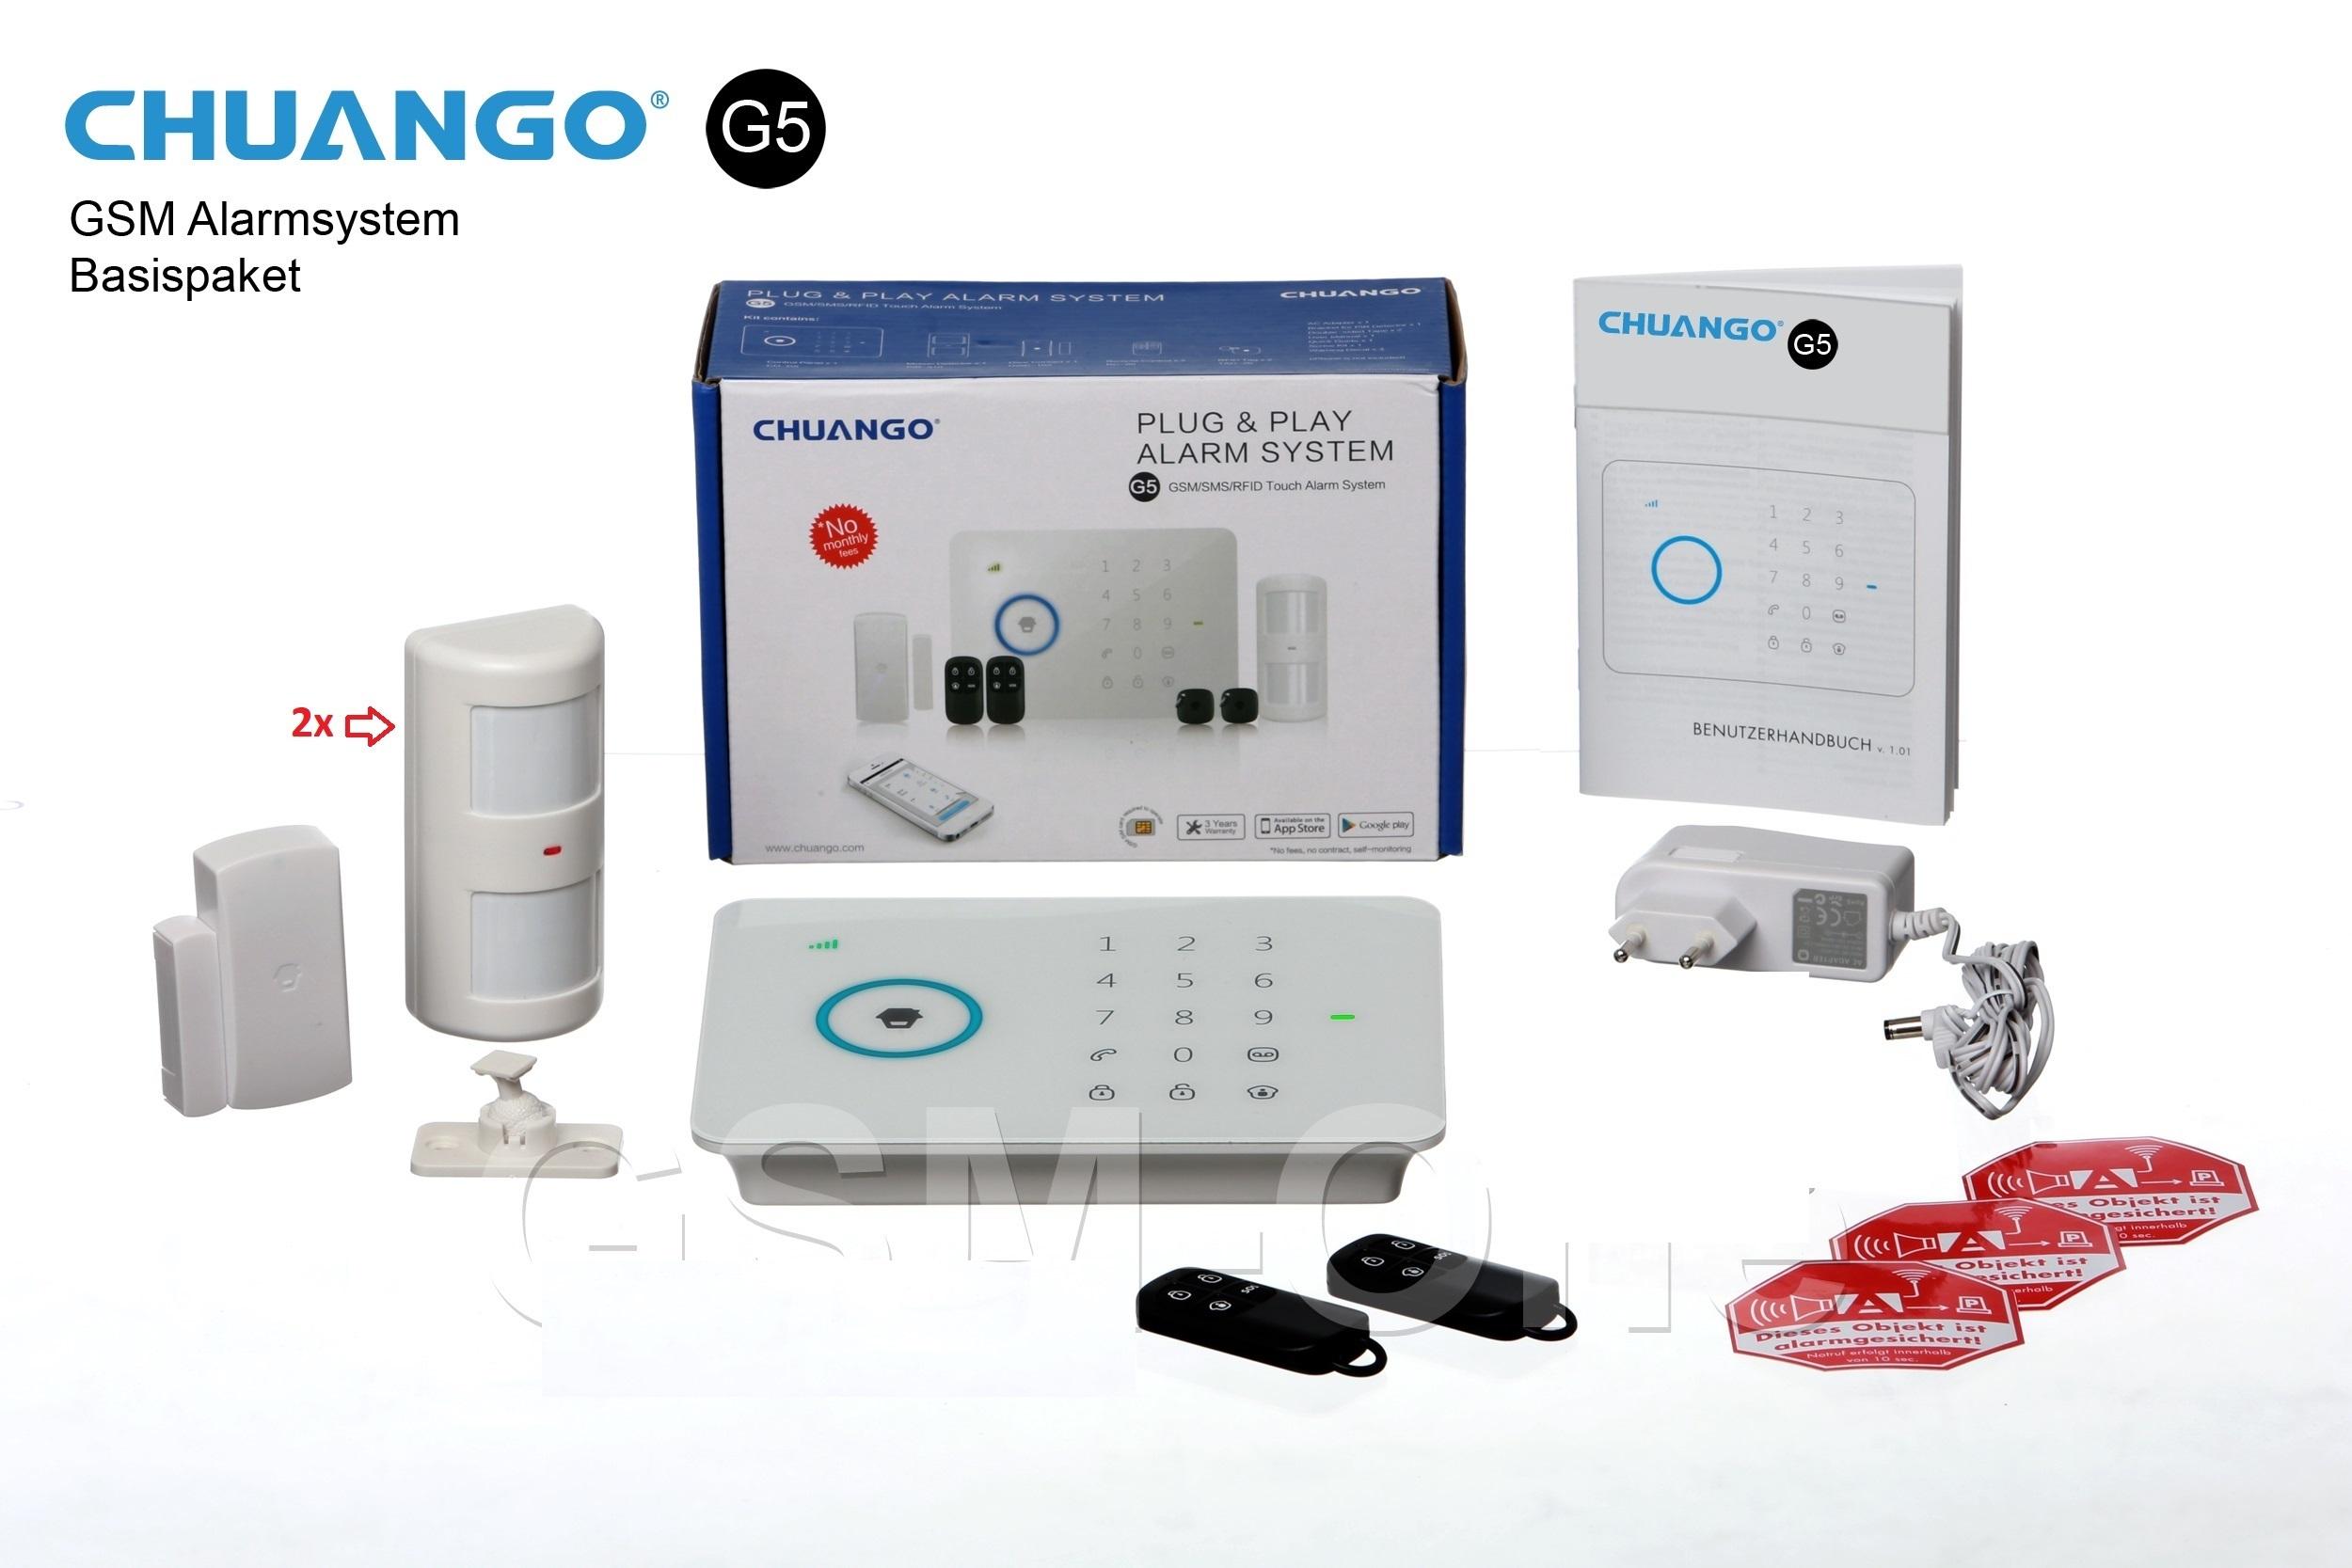 GSM Alarmanlage CHUANGO G5-Bulk (Neuware, ohne Karton), Basispaket inkl. App